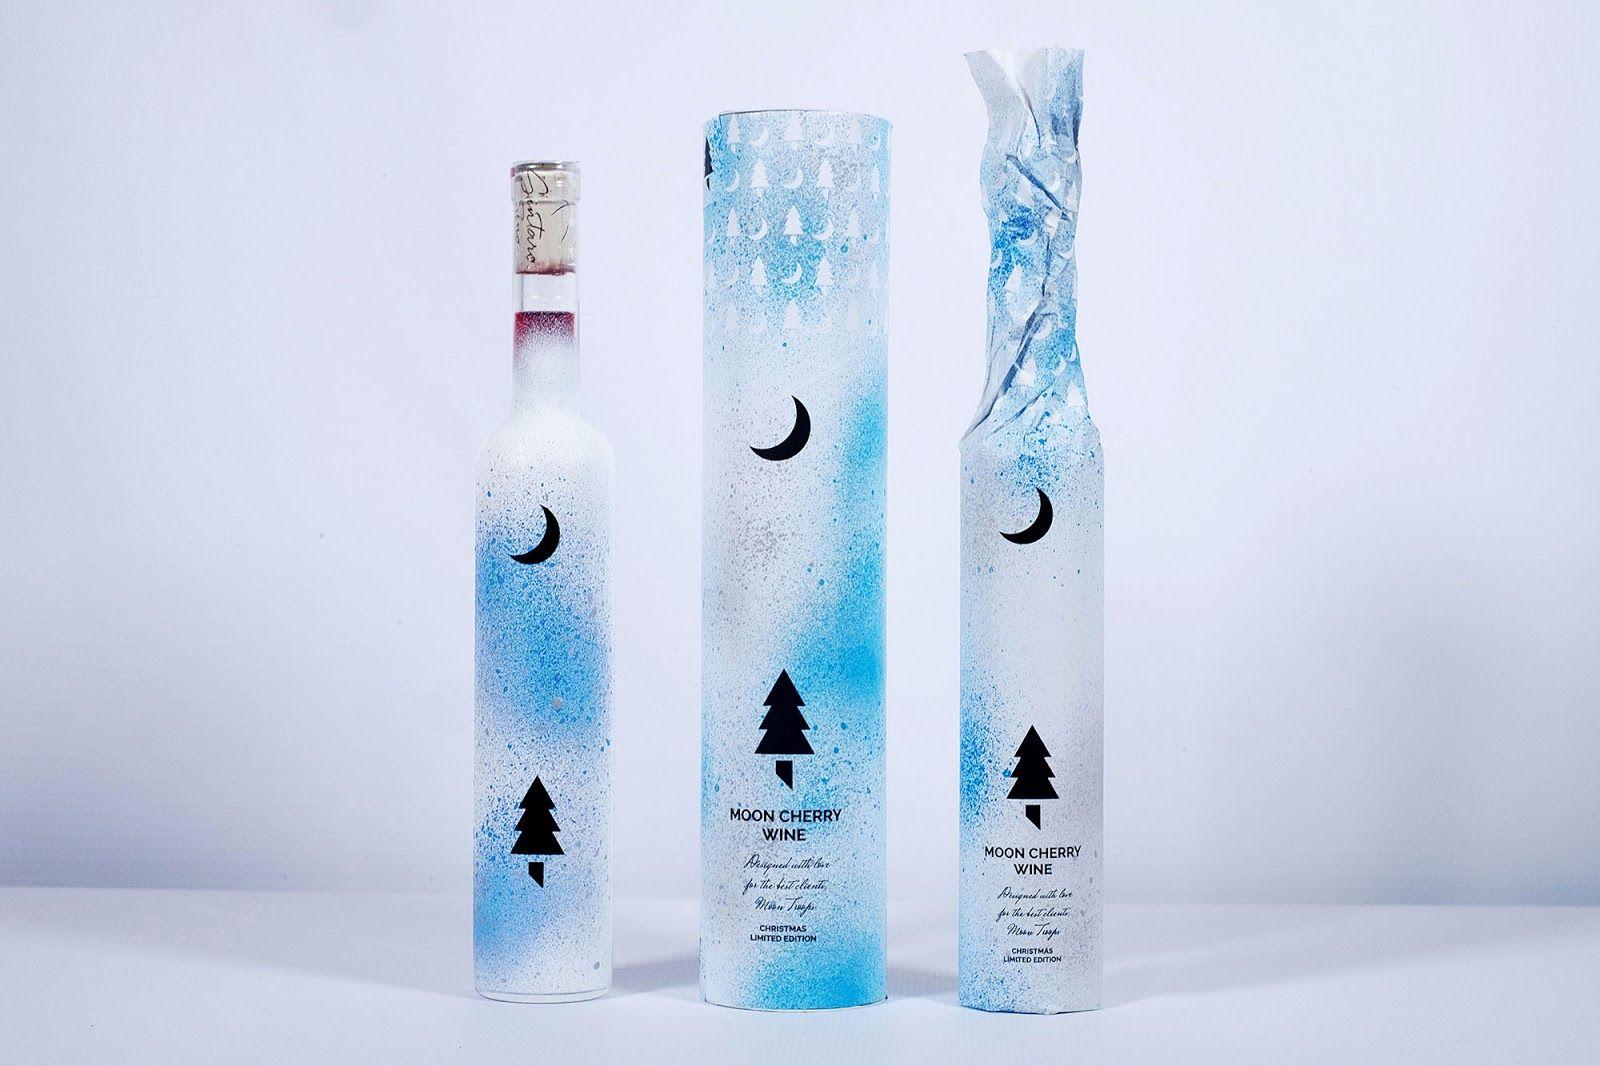 Wine Christmas Packaging.Moon Cherry Wine Christmas Handmade Limited Edition